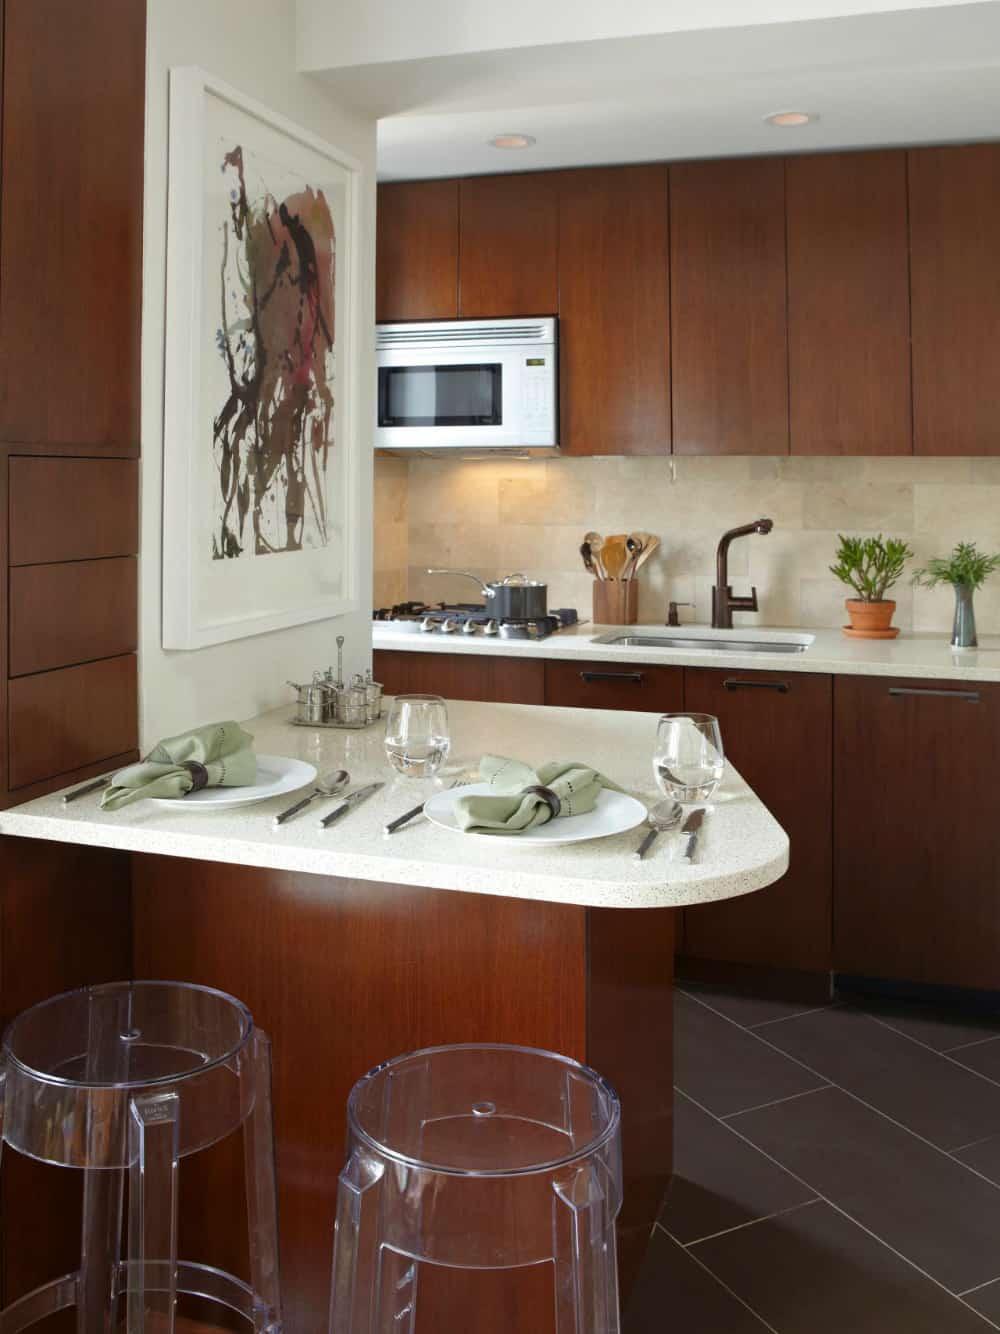 Small kitchen peninsula table